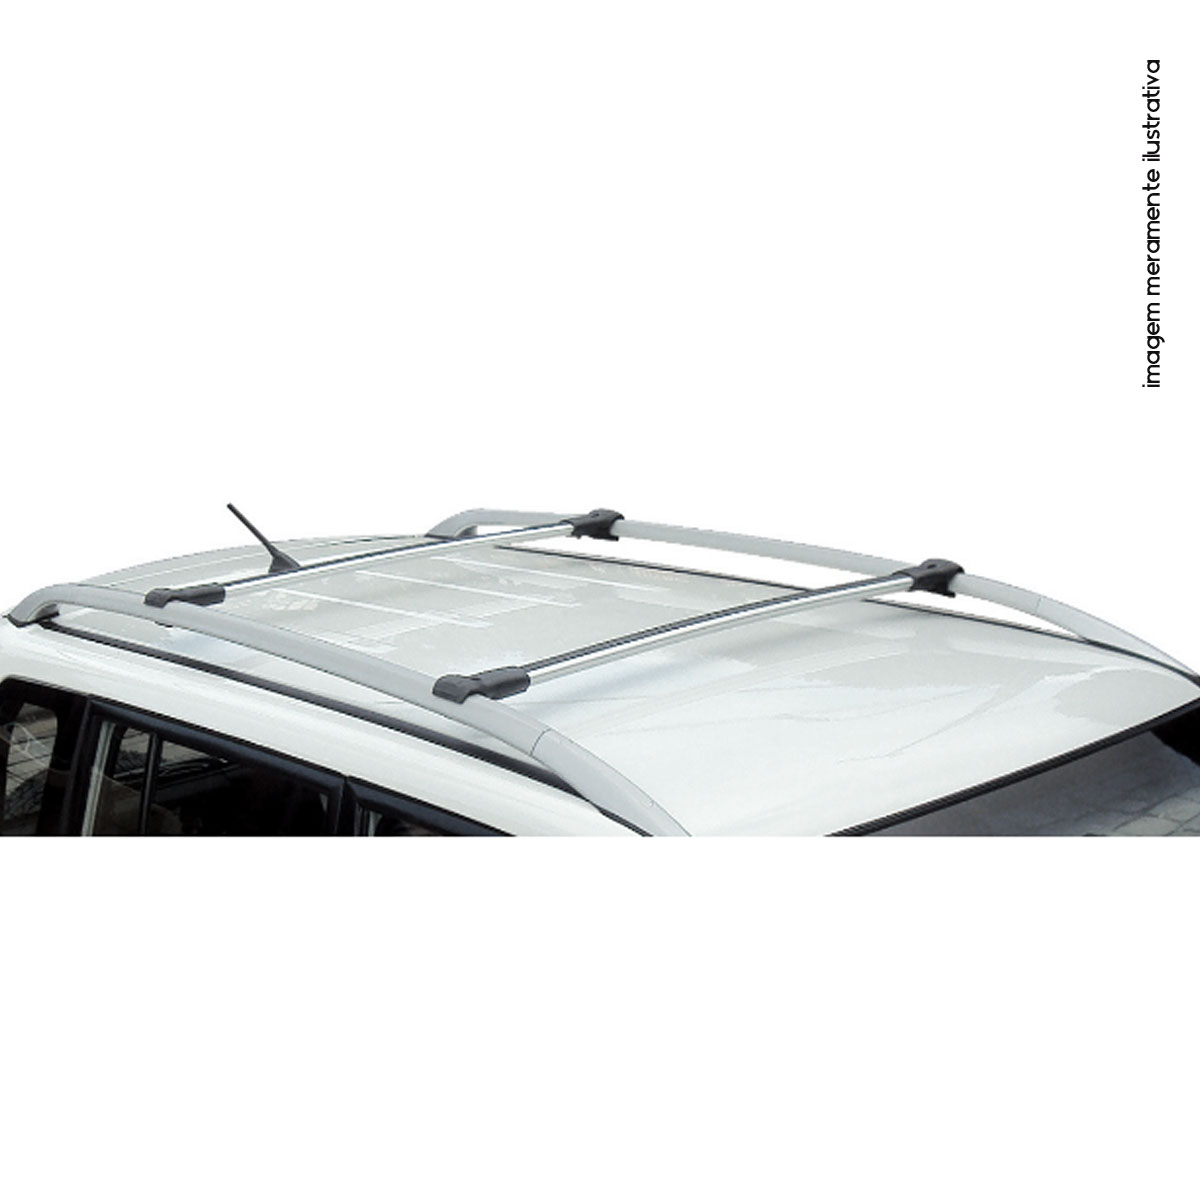 Travessa rack de teto larga alumínio Zafira 2001 a 2012